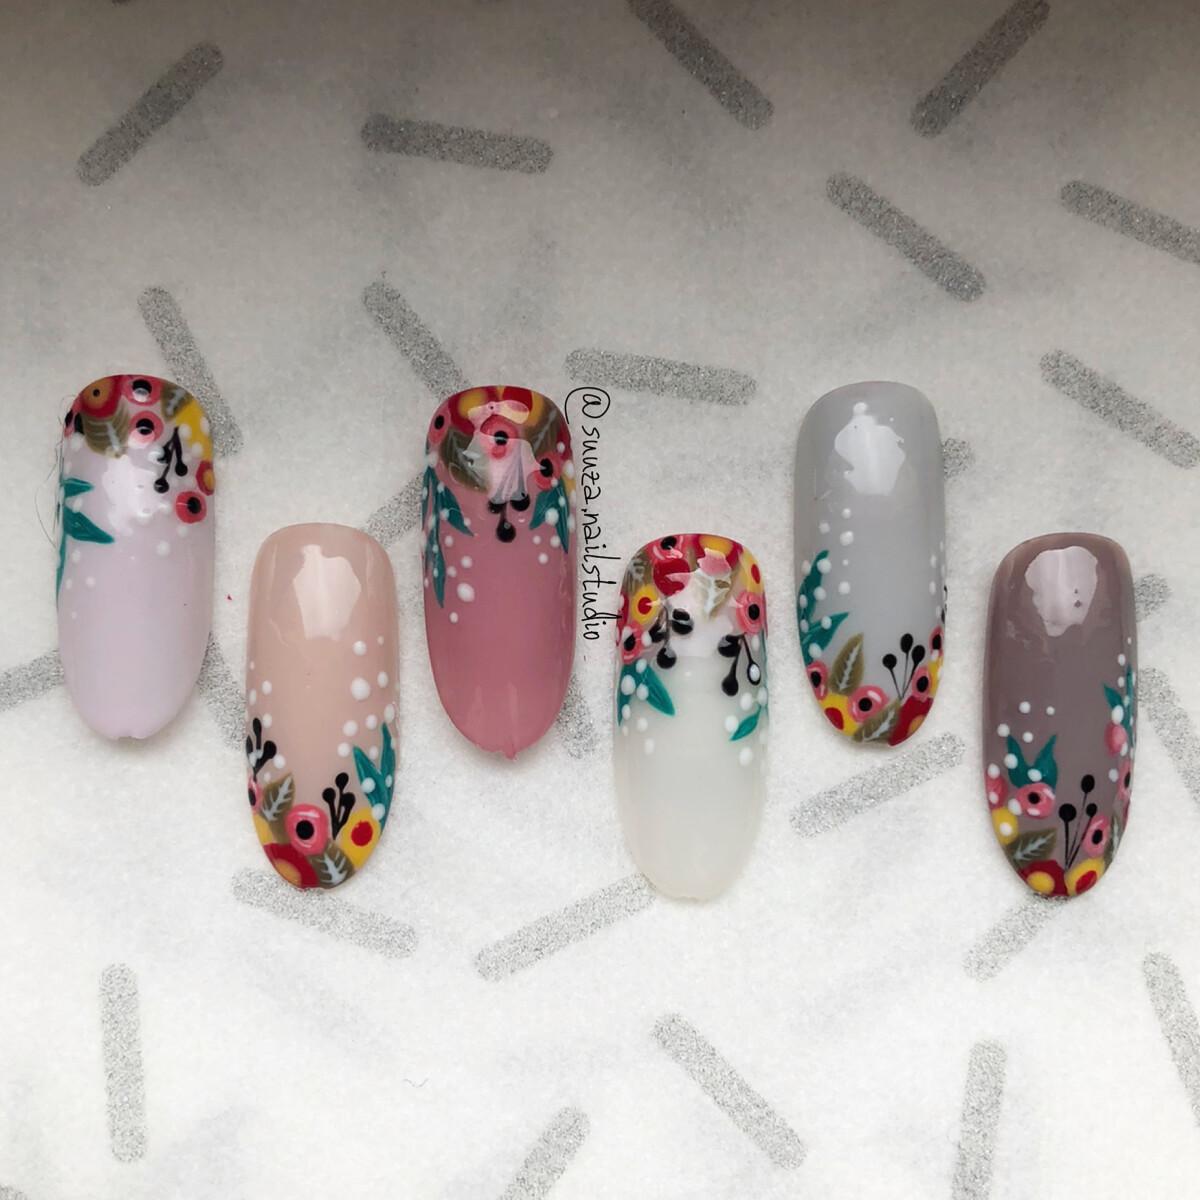 Botanica nail art